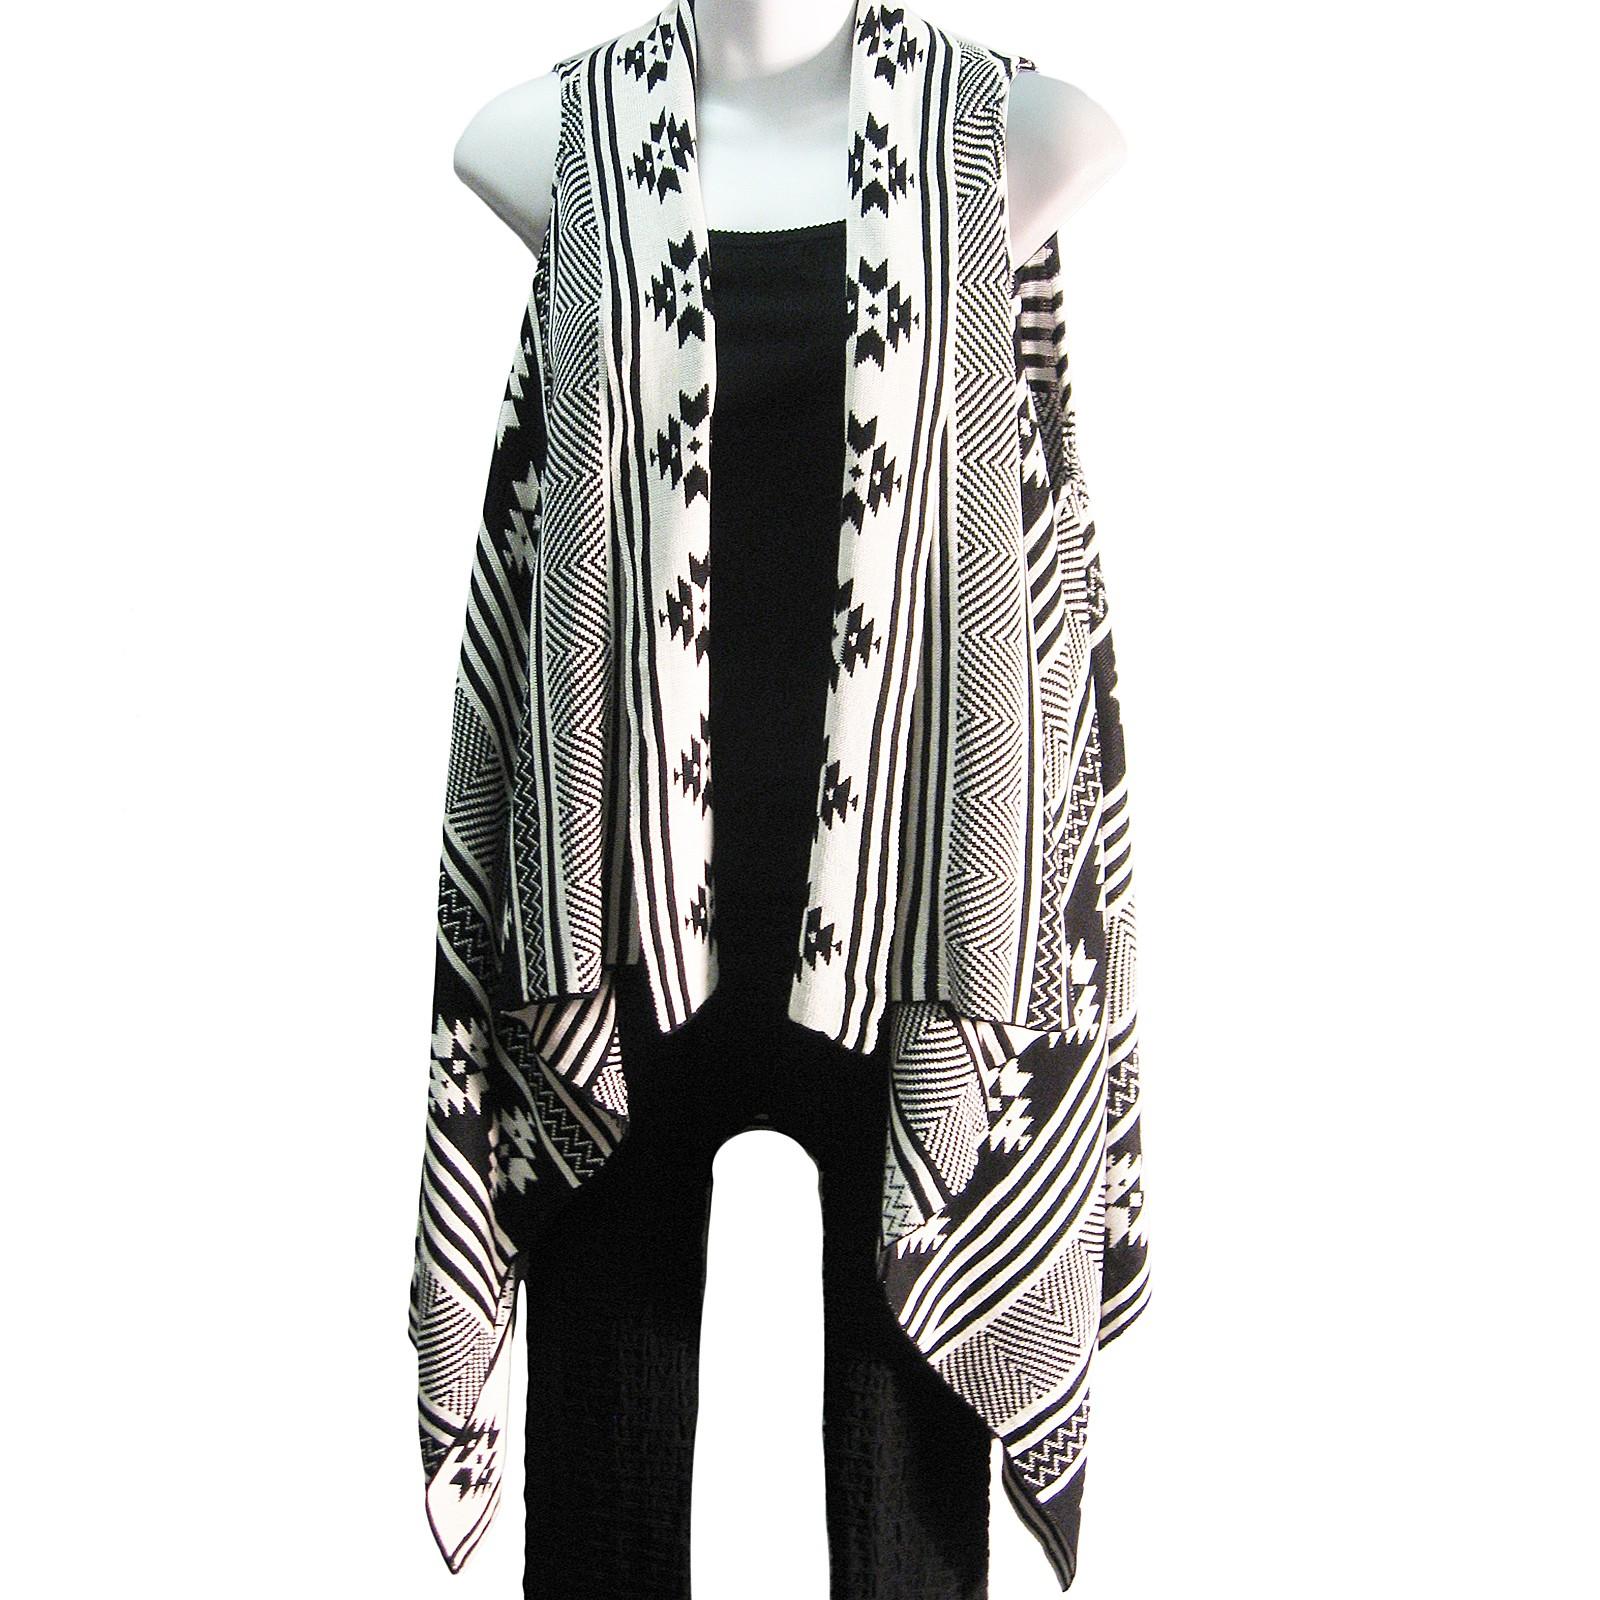 Black and White Geometric Print Sleeveless Sweater Tunic